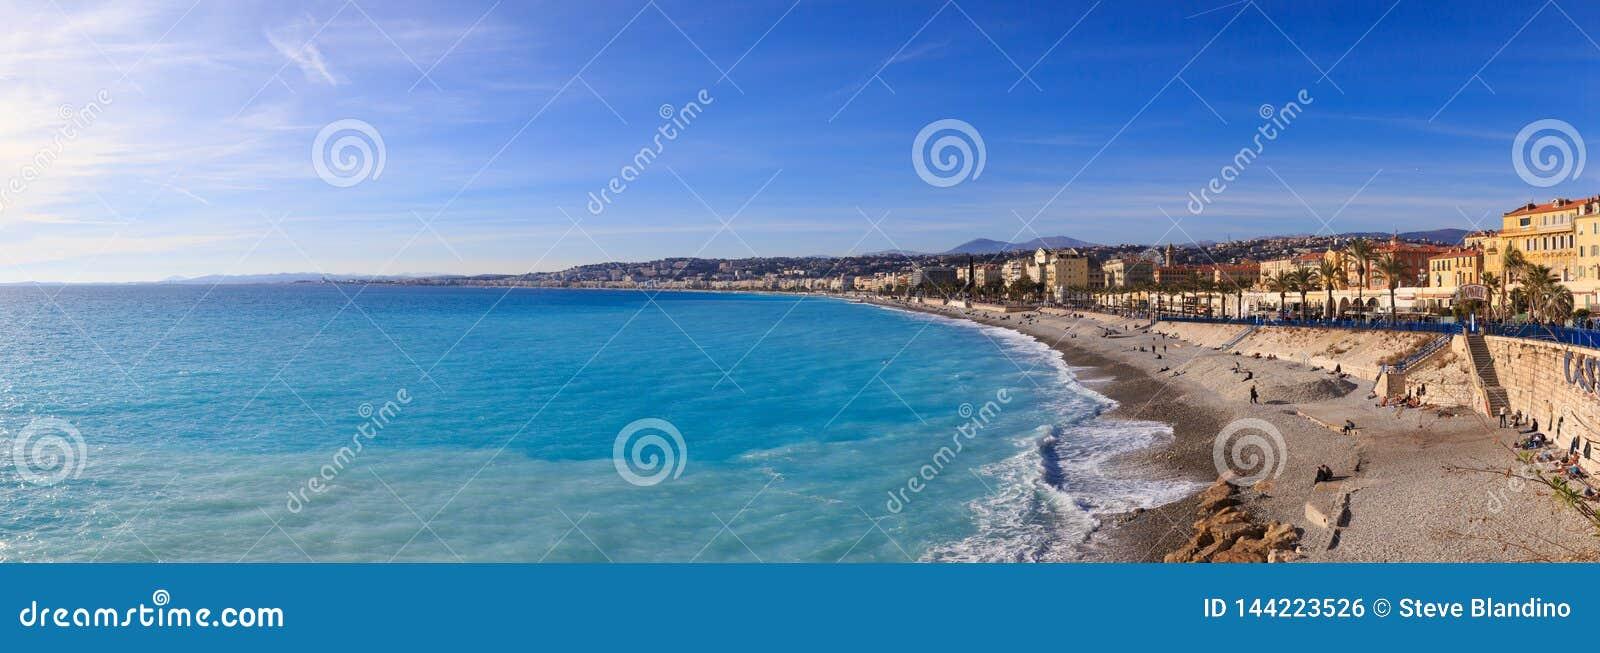 Viaje a Niza DES Anglais de la  promenade